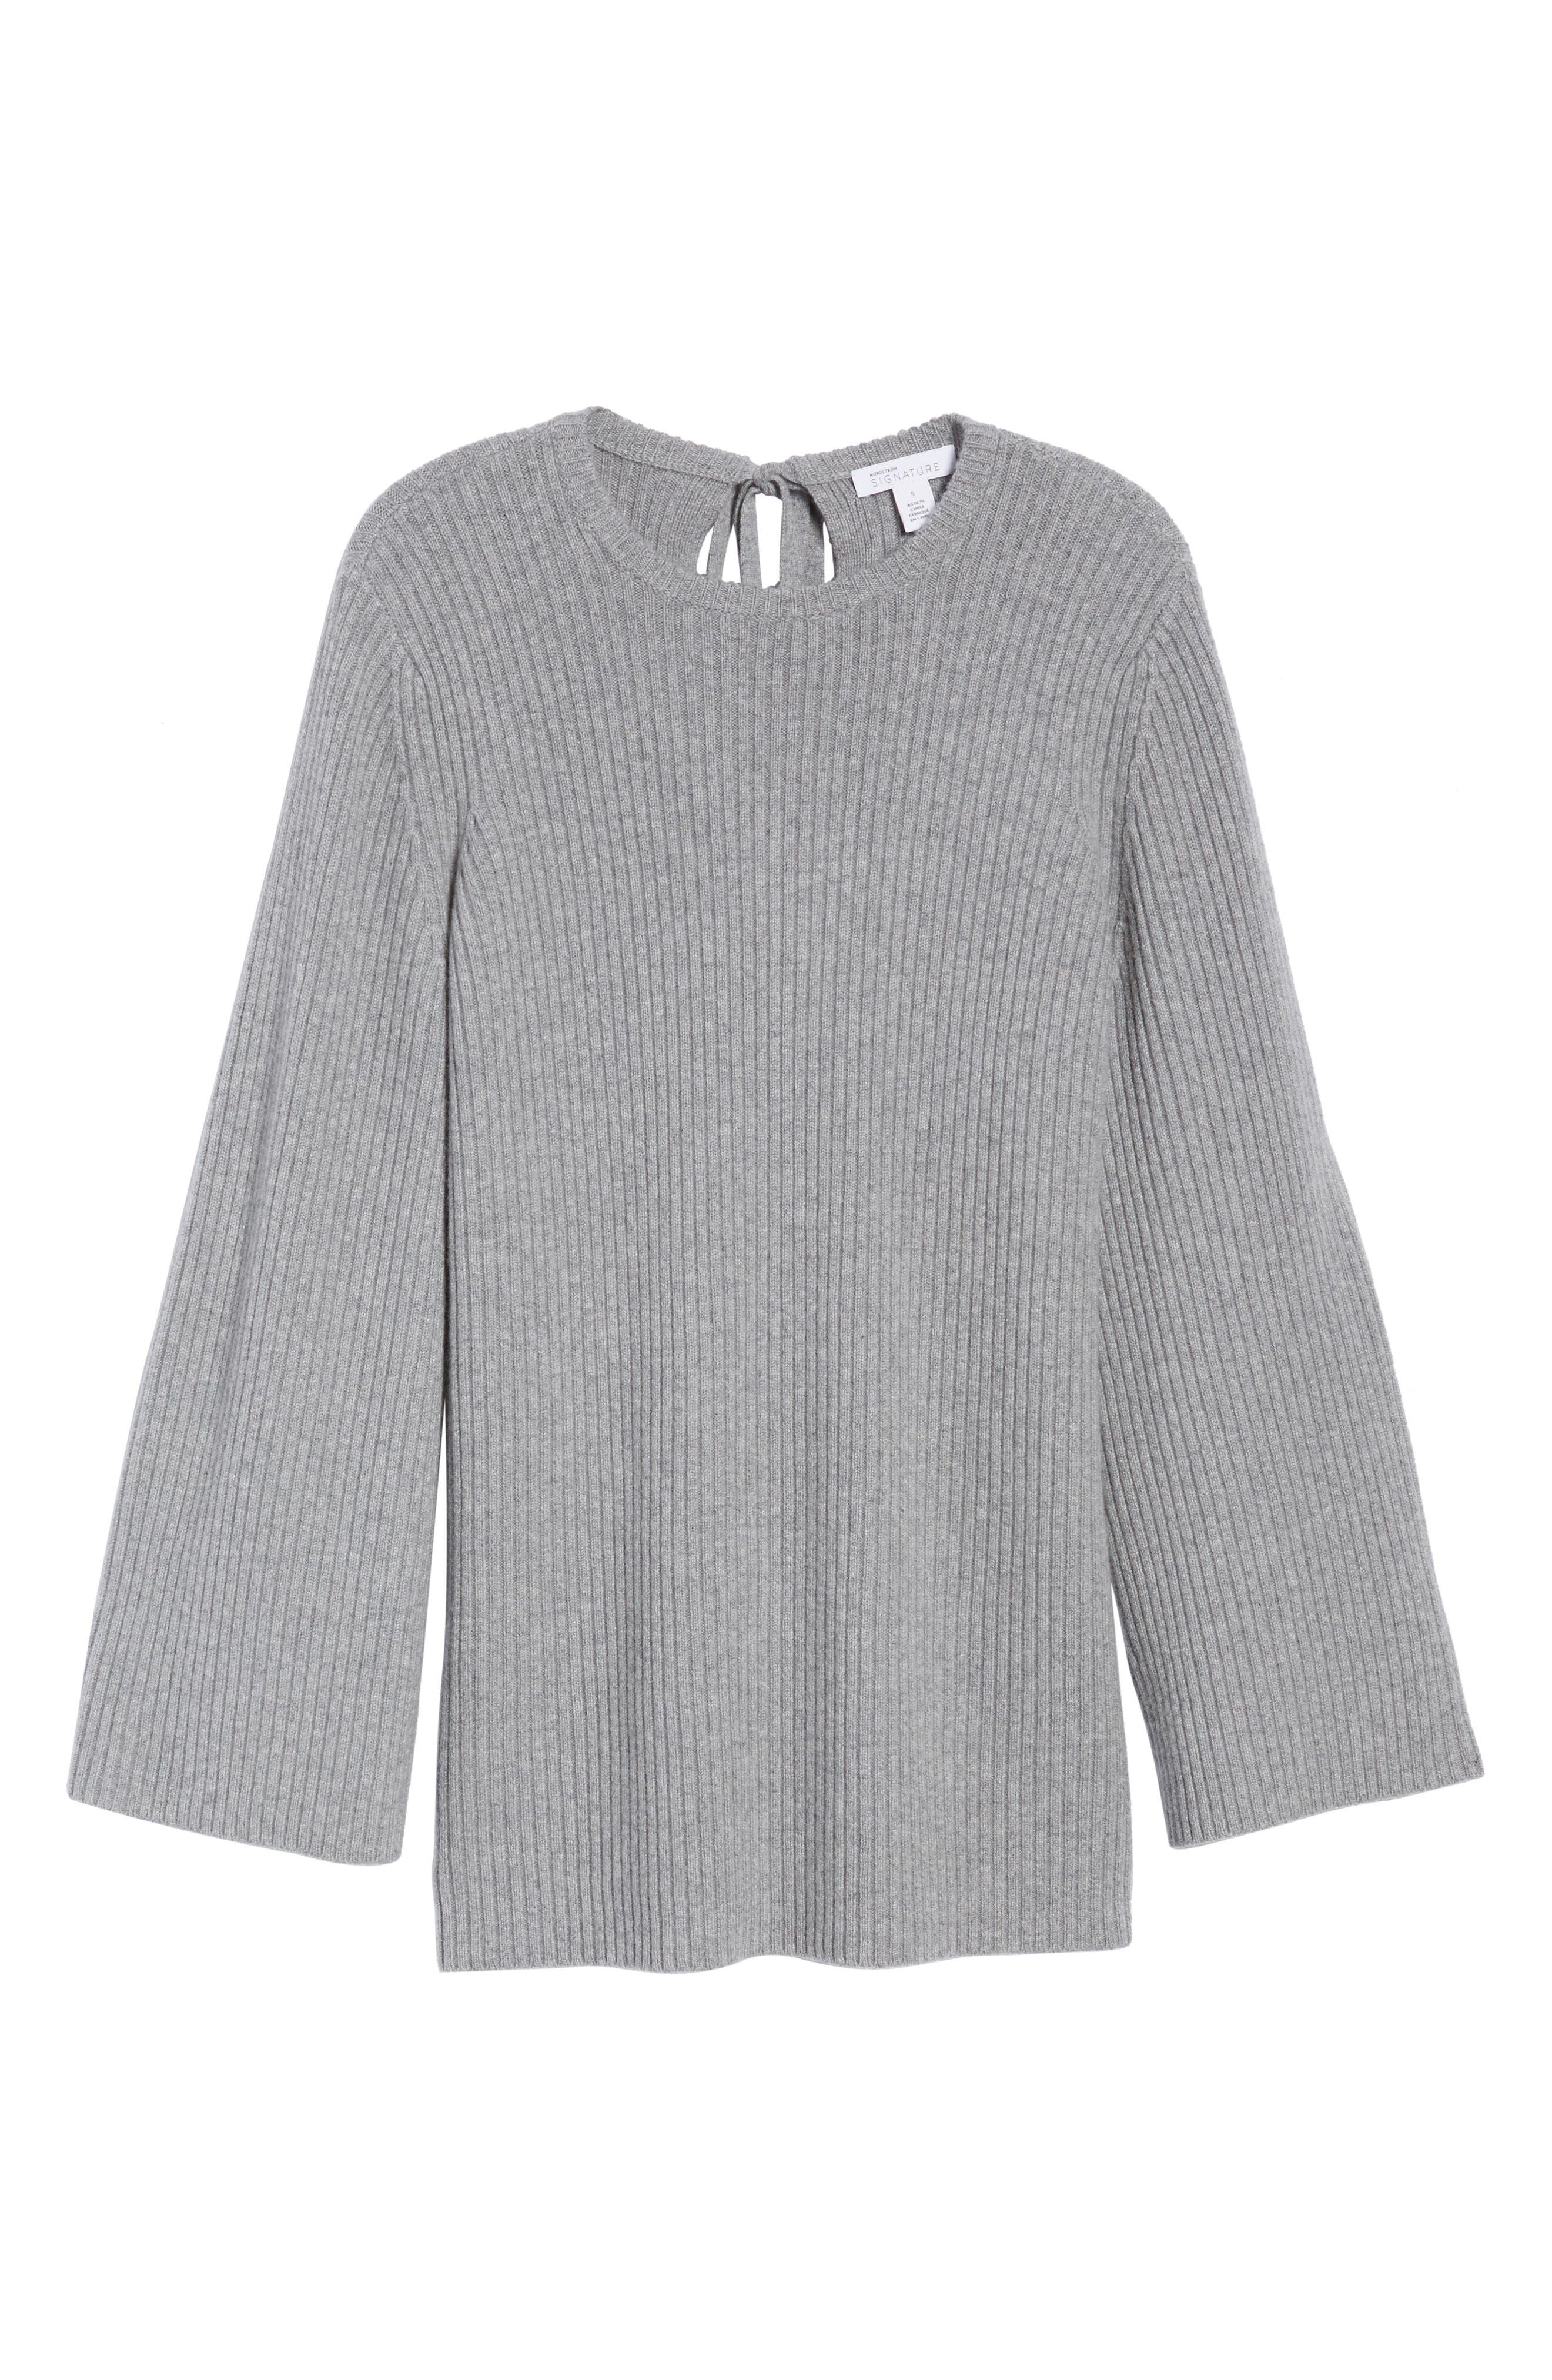 Tie Back Cashmere Blend Sweater,                             Alternate thumbnail 6, color,                             030